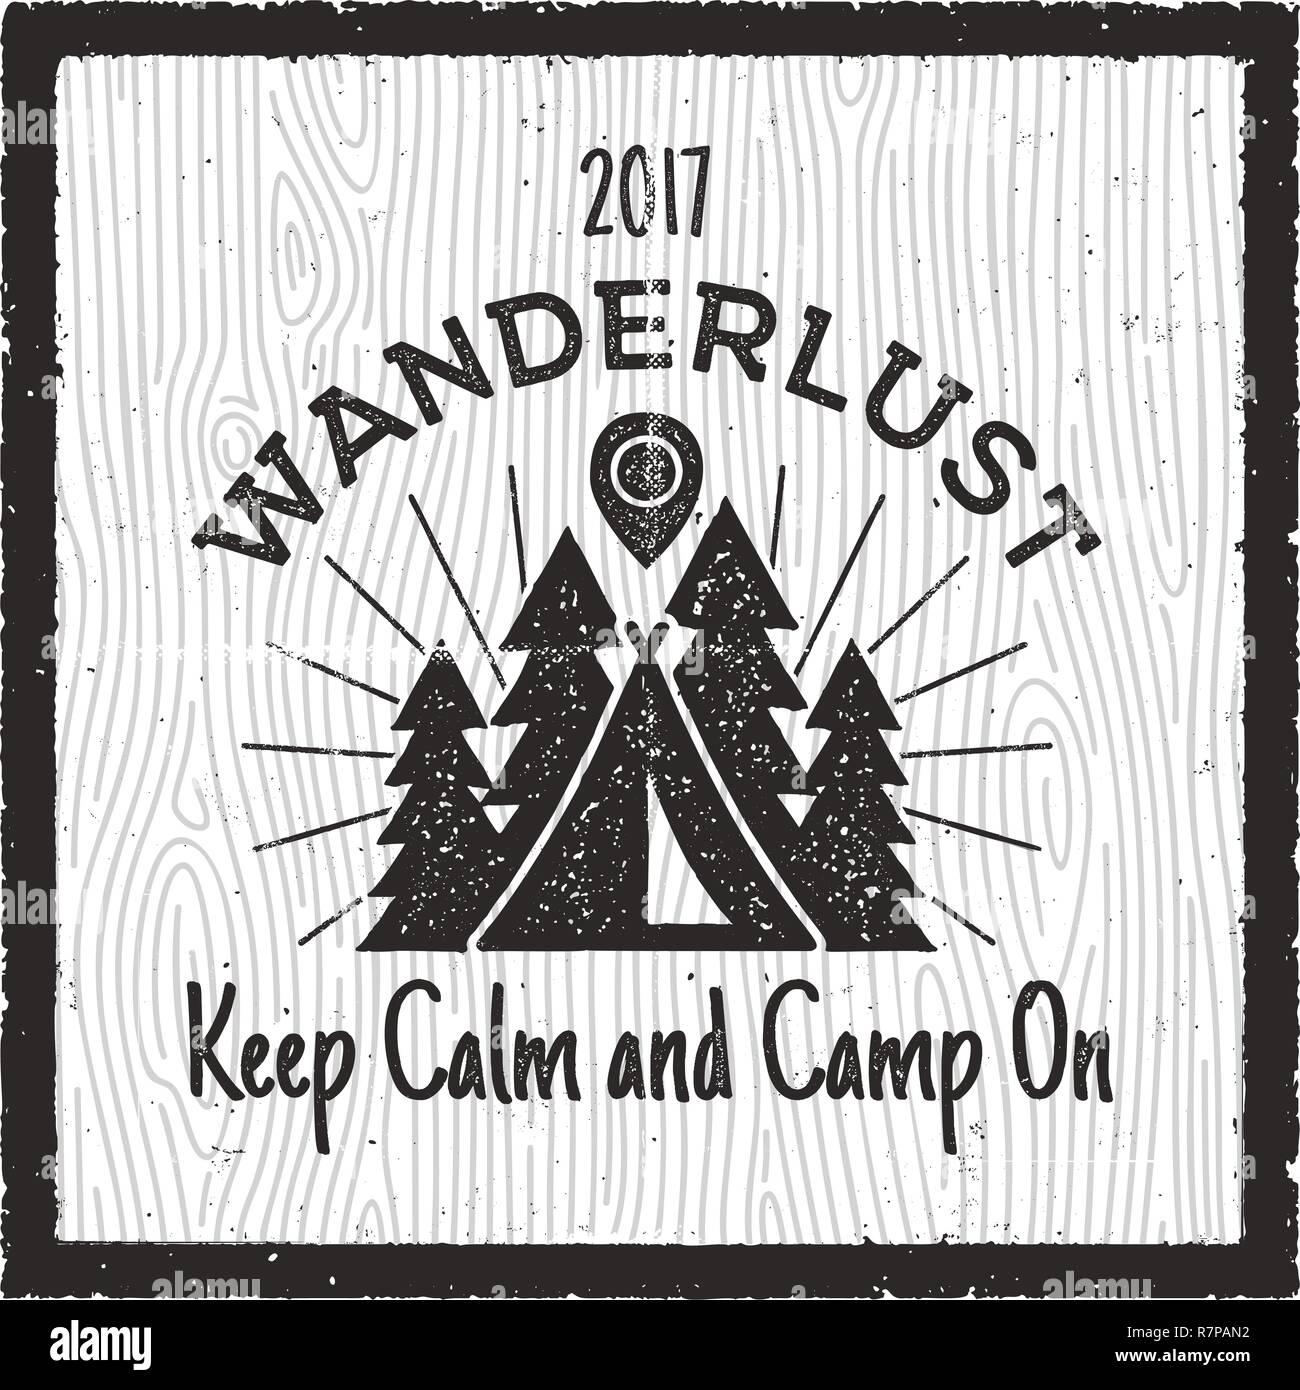 Wanderlust Camping badge  Old school hand drawn t shirt